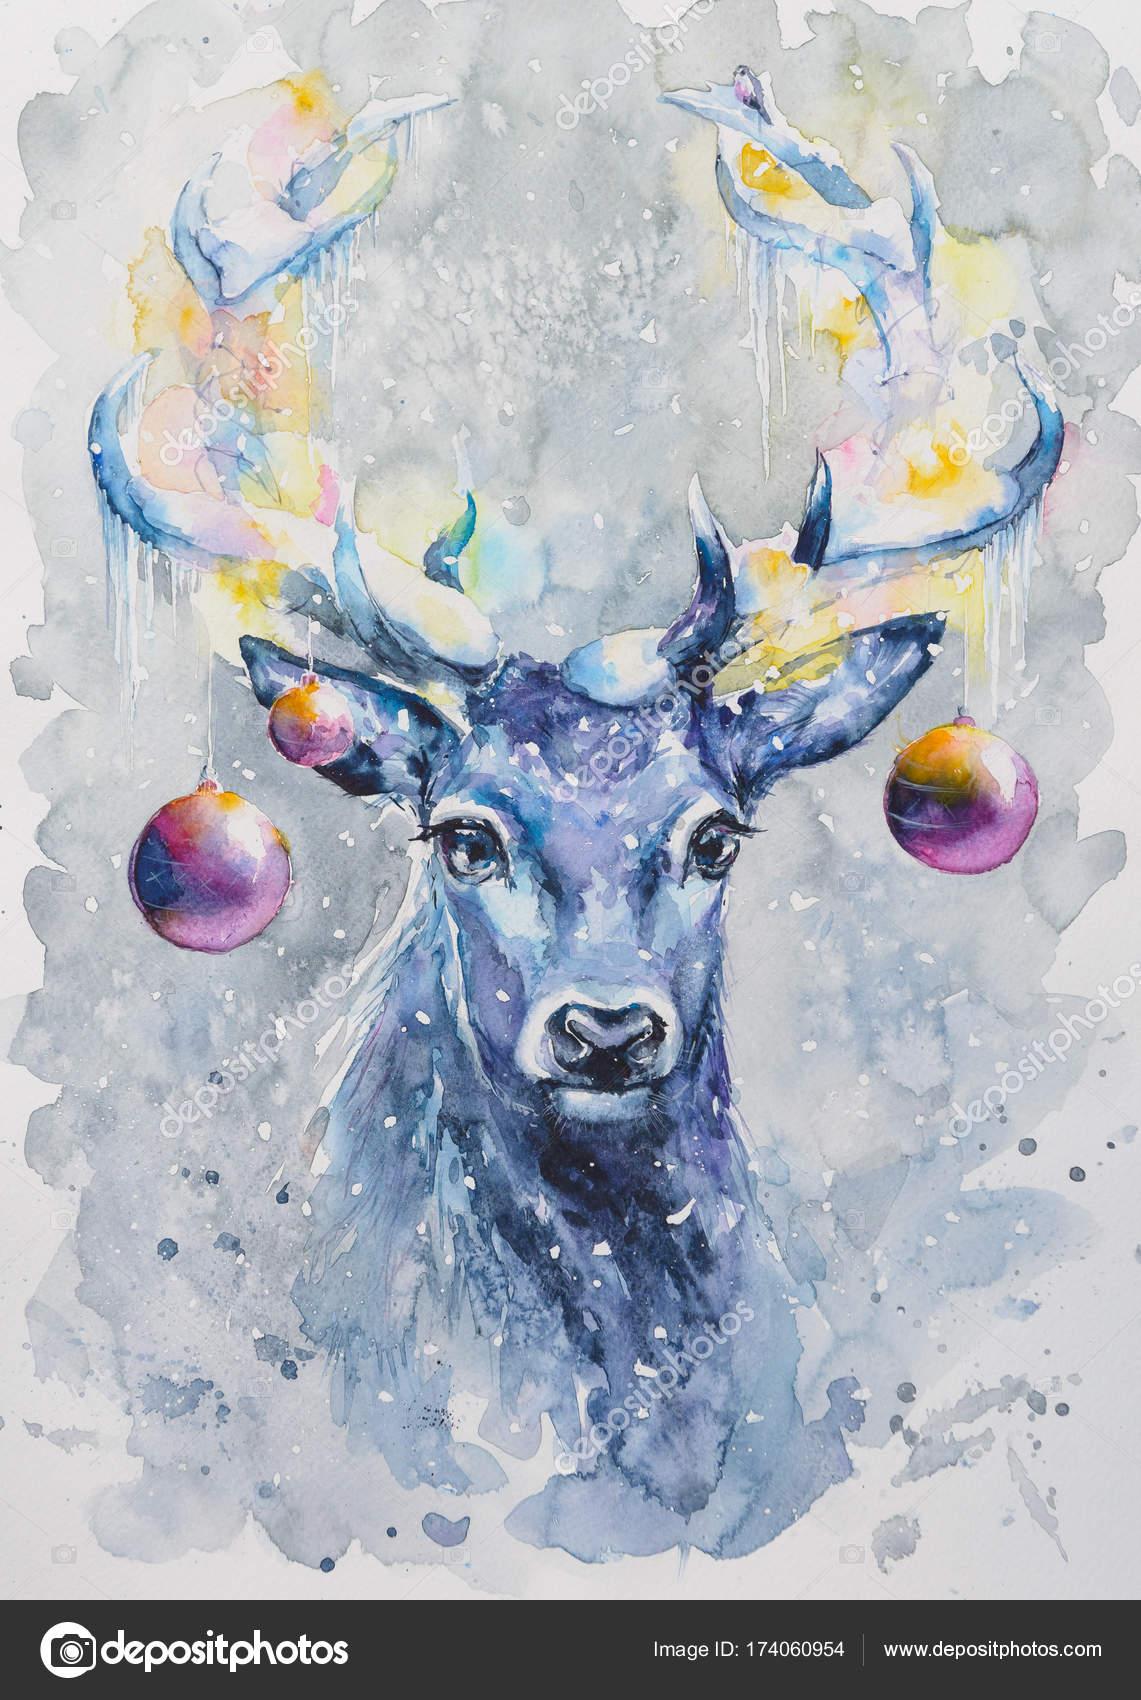 Watercolors Painted Christmas Card Cute Deer Decorated Bells Stock Photo